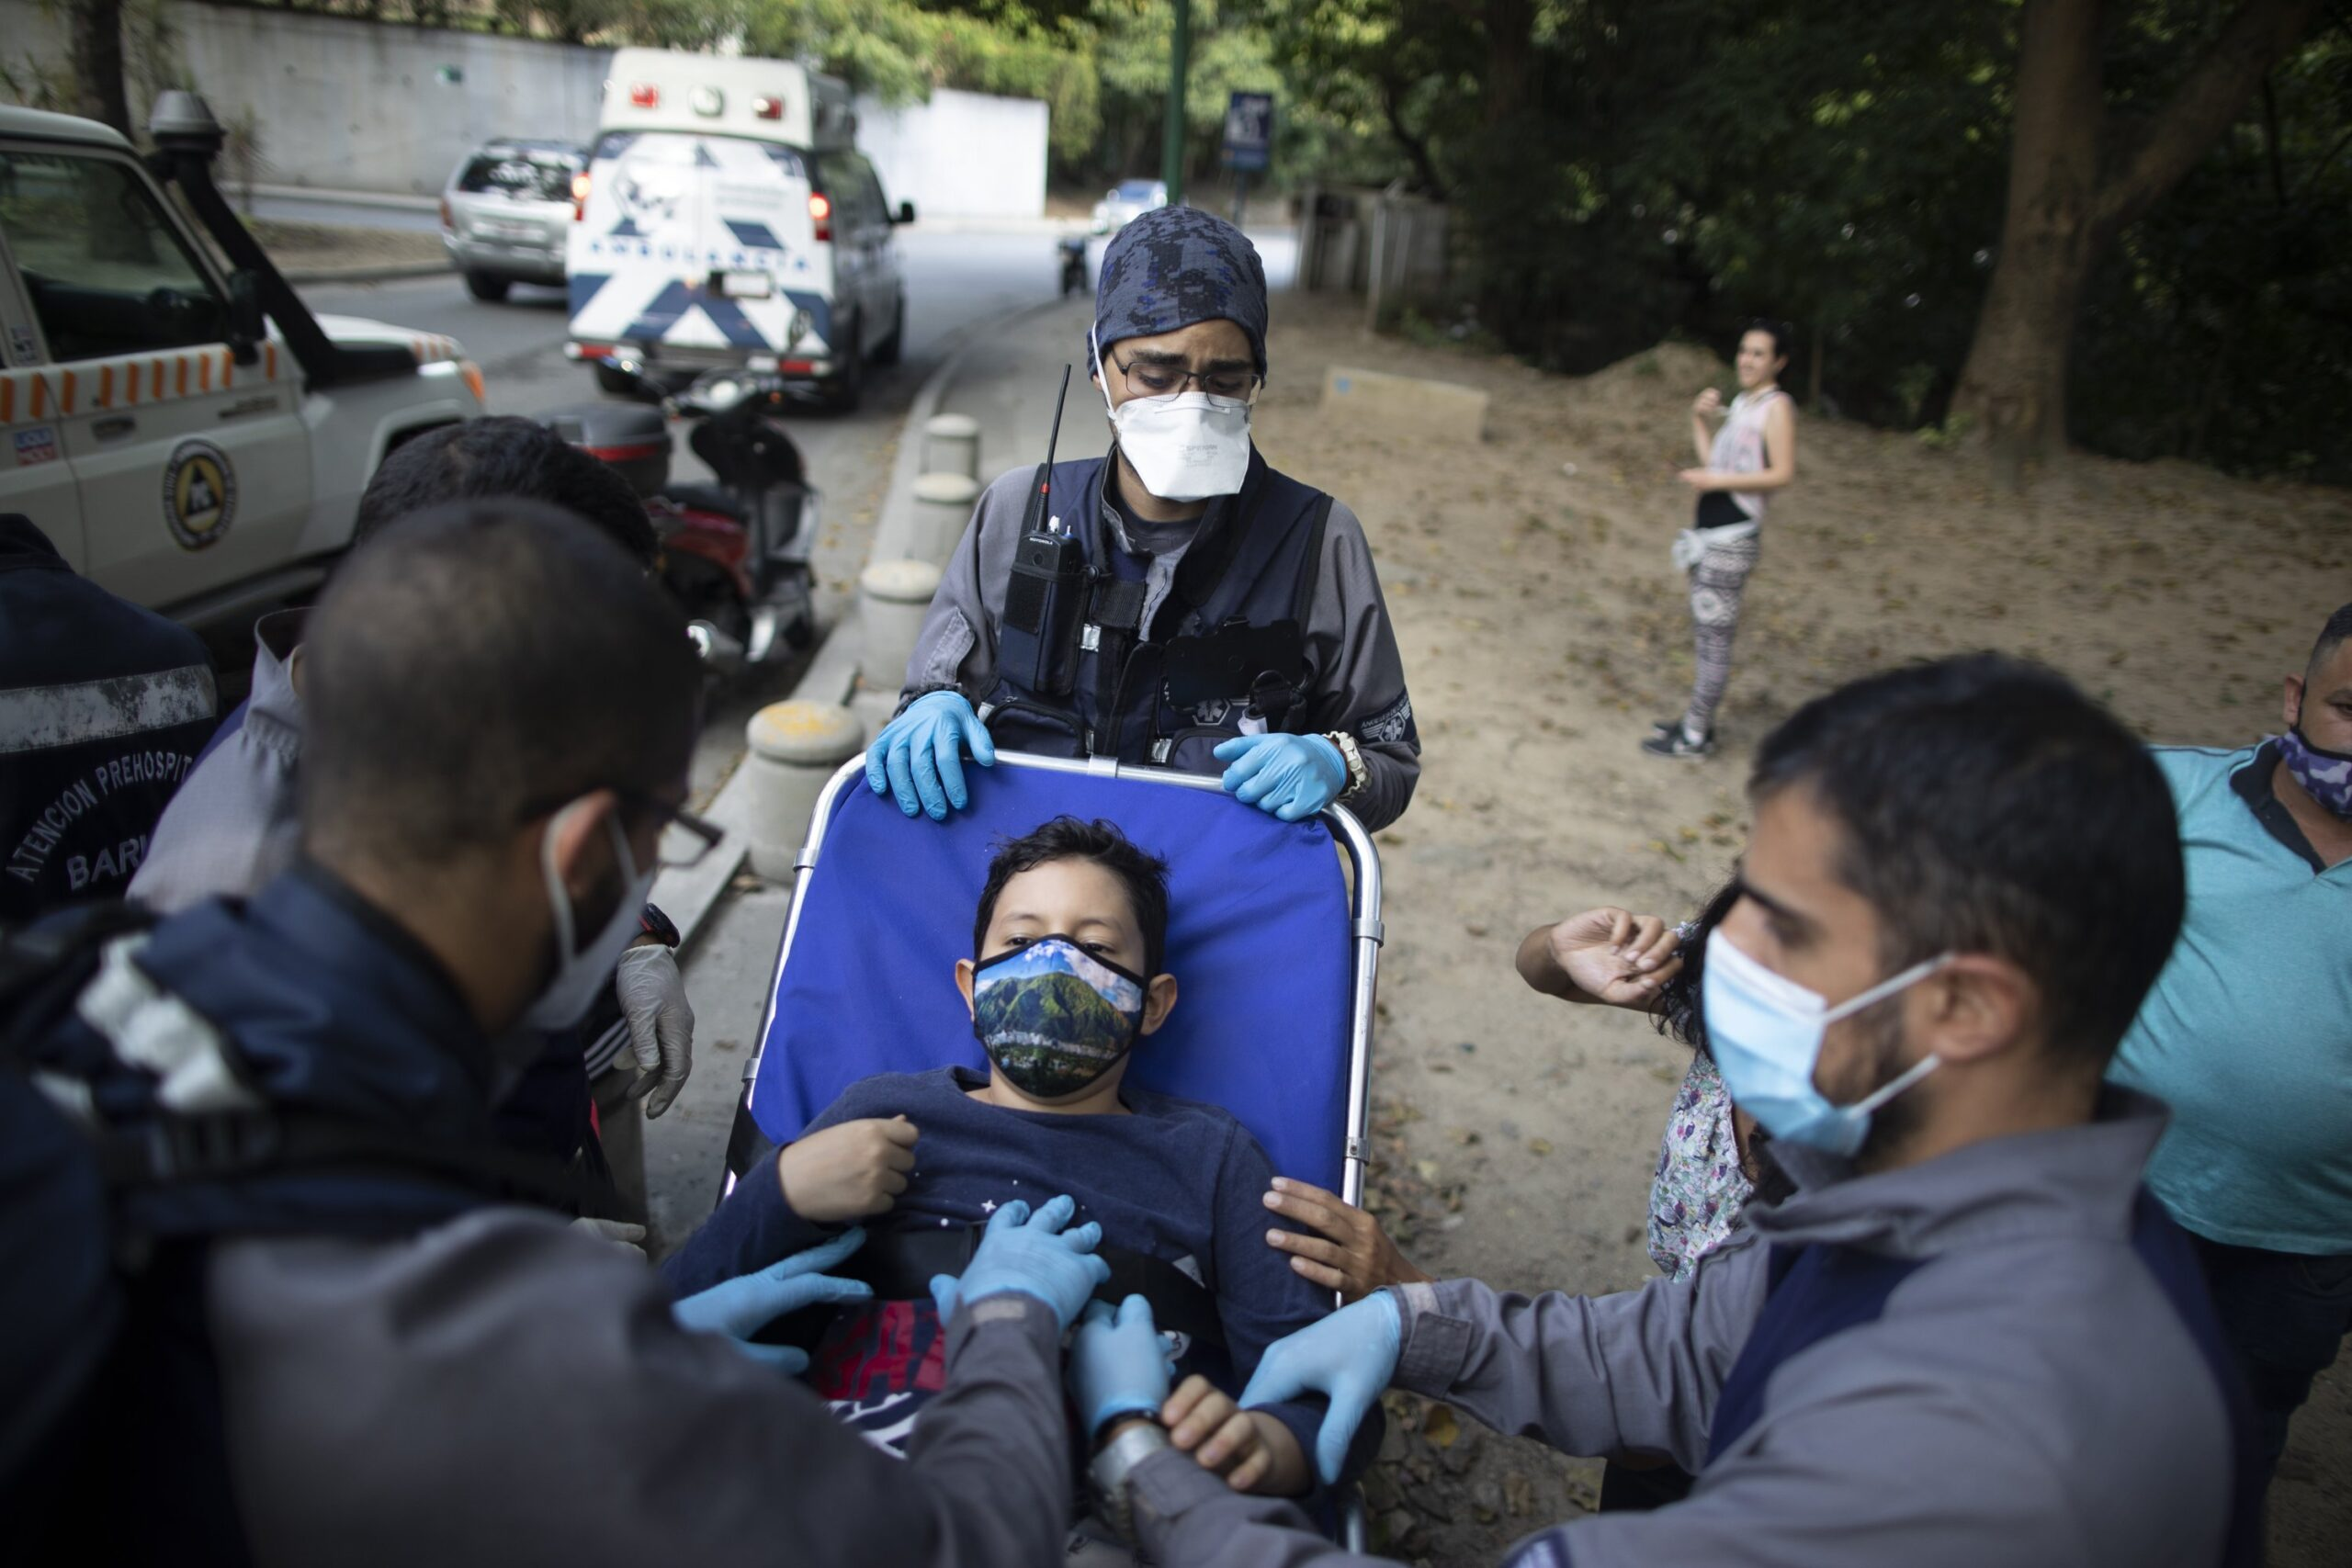 Volunteer paramedics patrol streets of Venezuela's capital